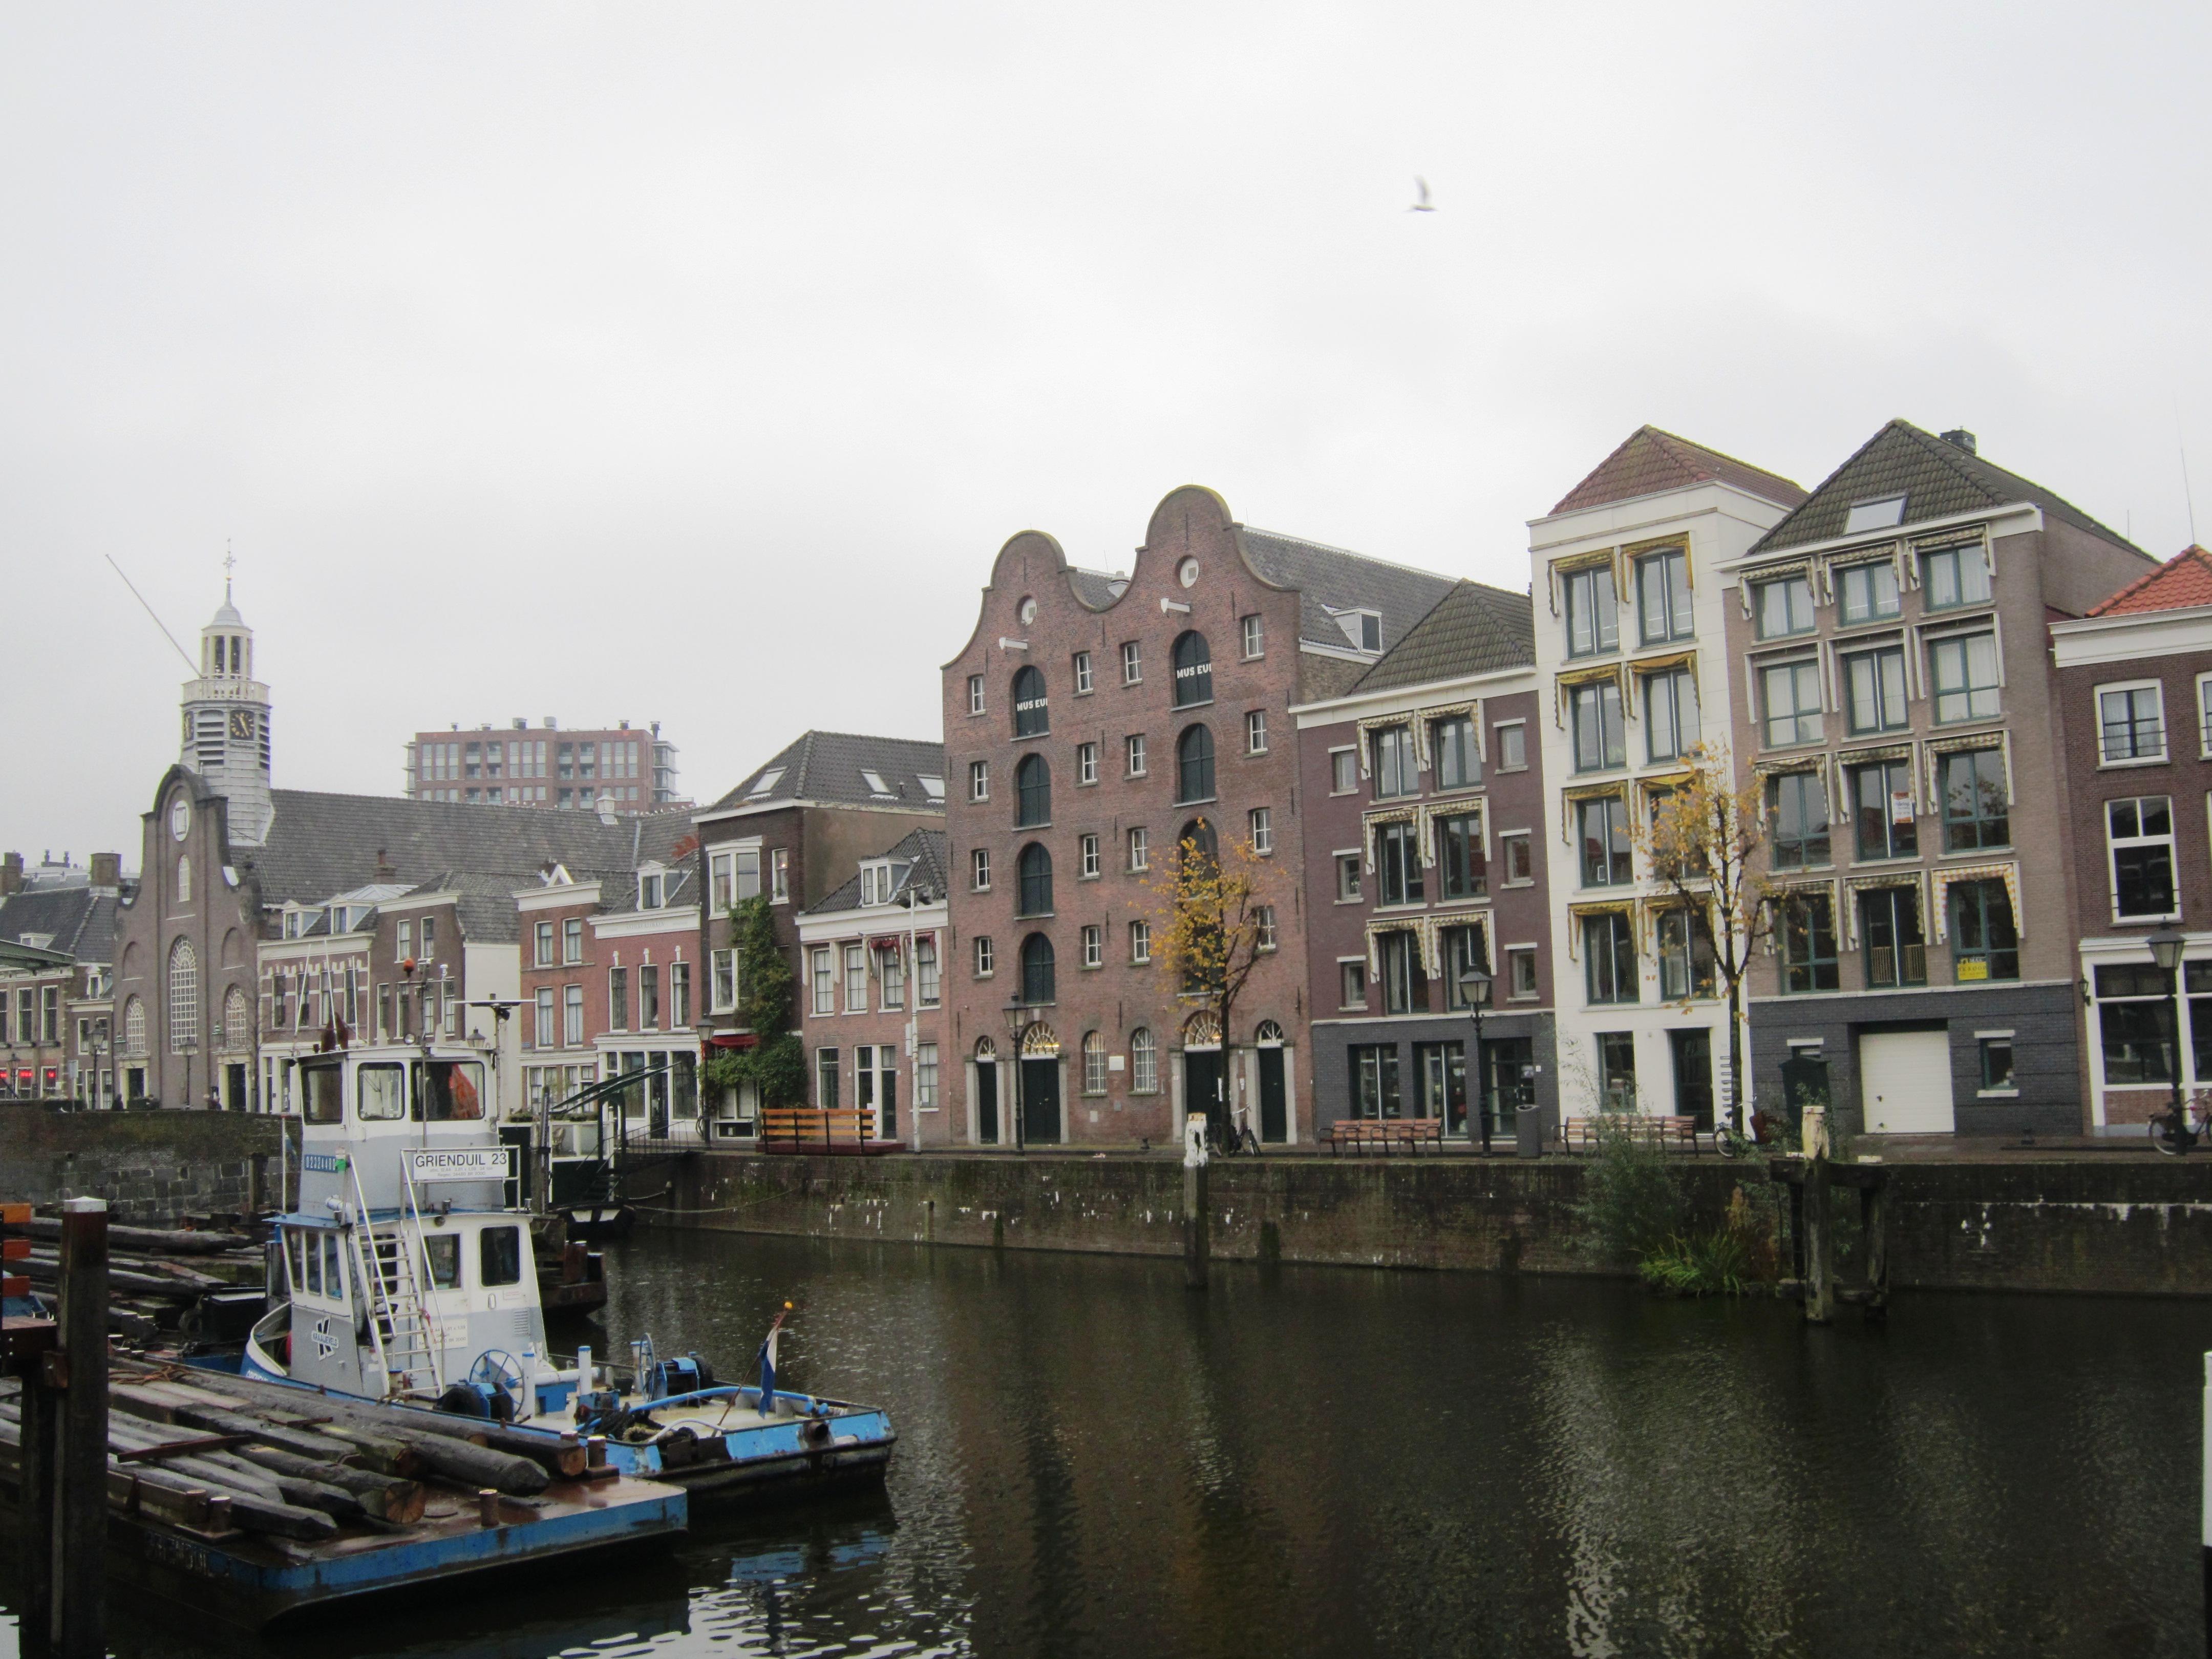 Rotterdam Netherlands  city photos gallery : Description Delfshaven Rotterdam the Netherlands 09